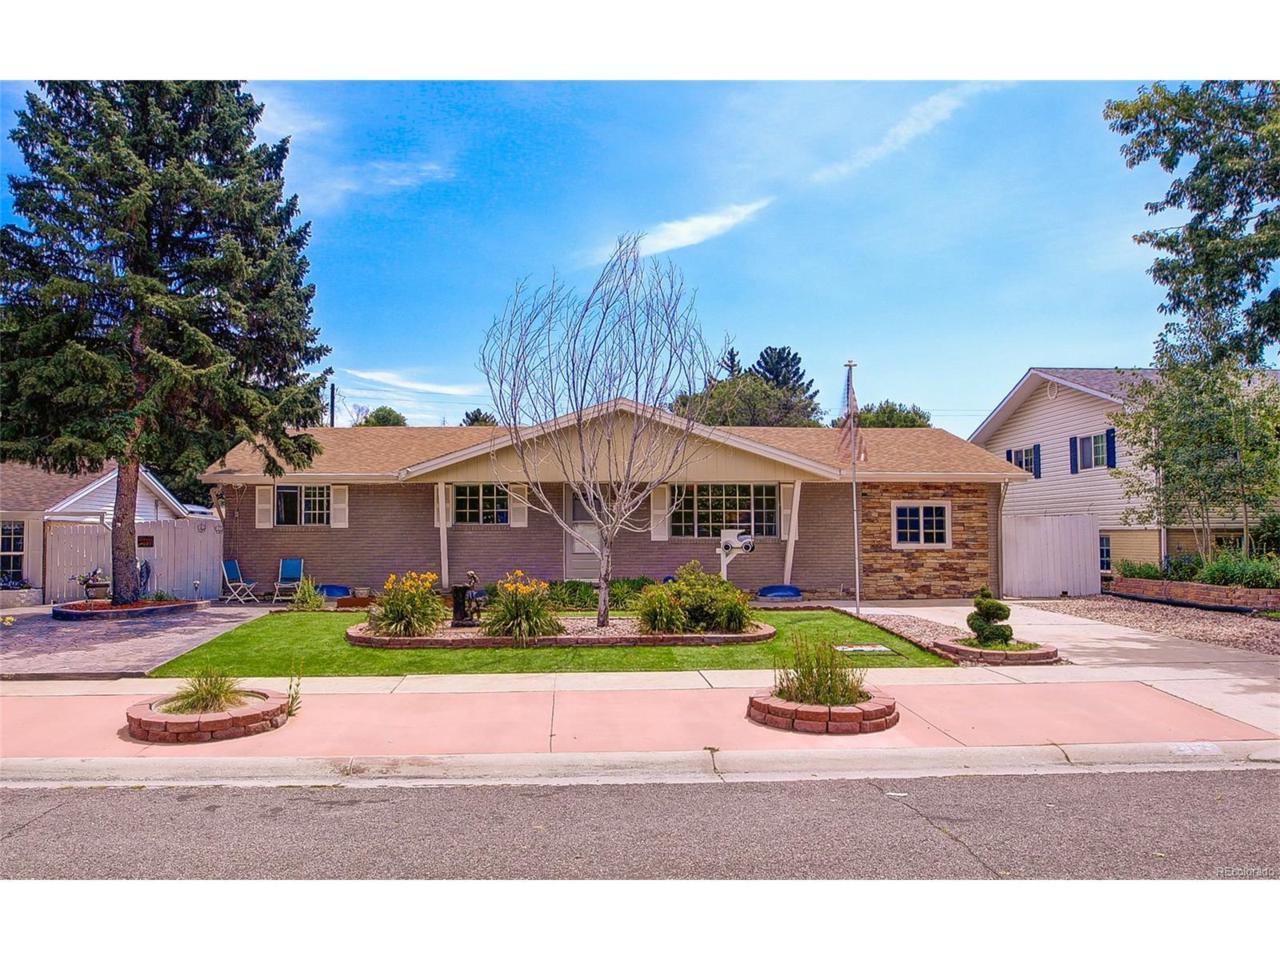 2121 Monteagle Street, Colorado Springs, CO 80909 (MLS #9672887) :: 8z Real Estate